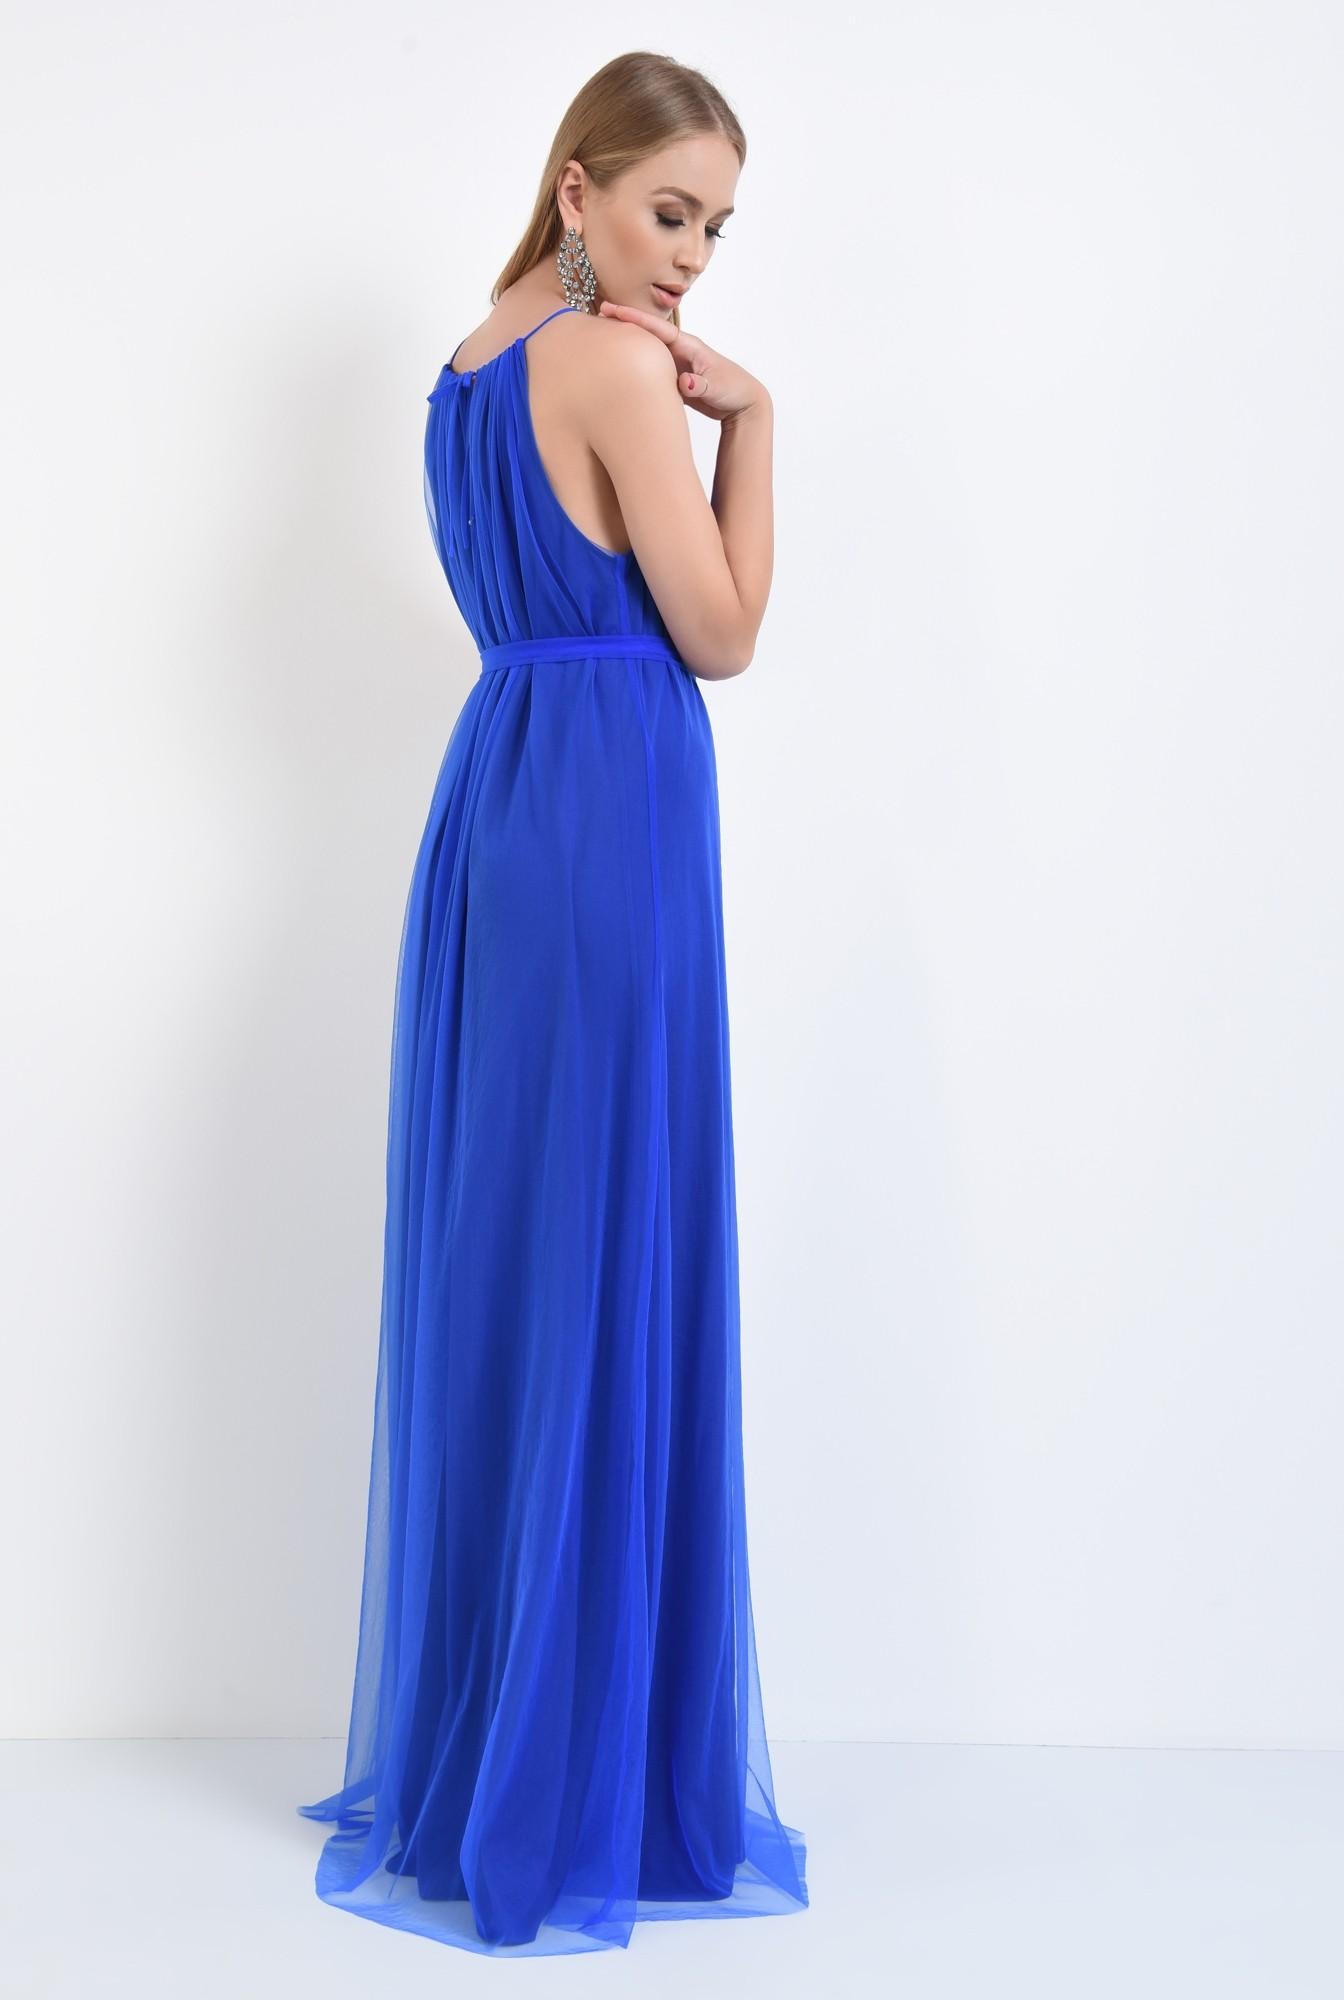 1 - rochie de ocazie, tul, lunga, albastru